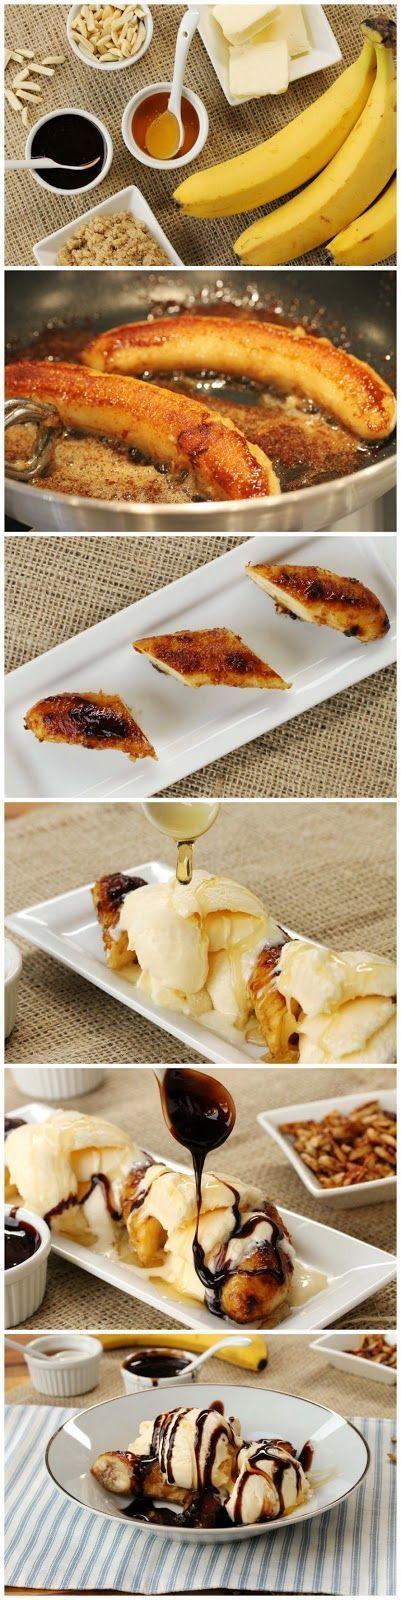 Brown Butter Banana Dessert ...... Also, Go to RMR 4 BREAKING NEWS !!! ...  RMR4 INTERNATIONAL.INFO  ... Register for our BREAKING NEWS Webinar Broadcast at:  www.rmr4international.info/500_tasty_diabetic_recipes.htm    ... Don't miss it!